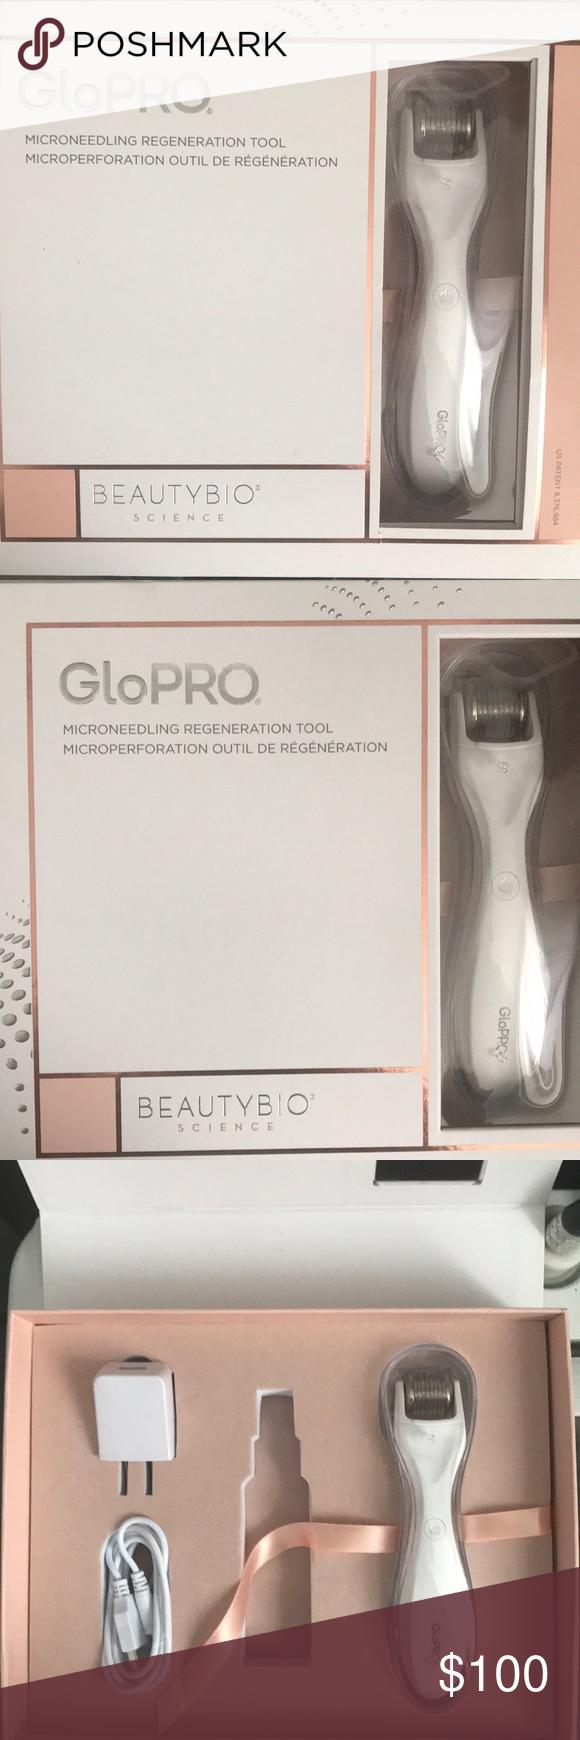 GloPro Microneedling Set Used ONCE. Fully Sanitized